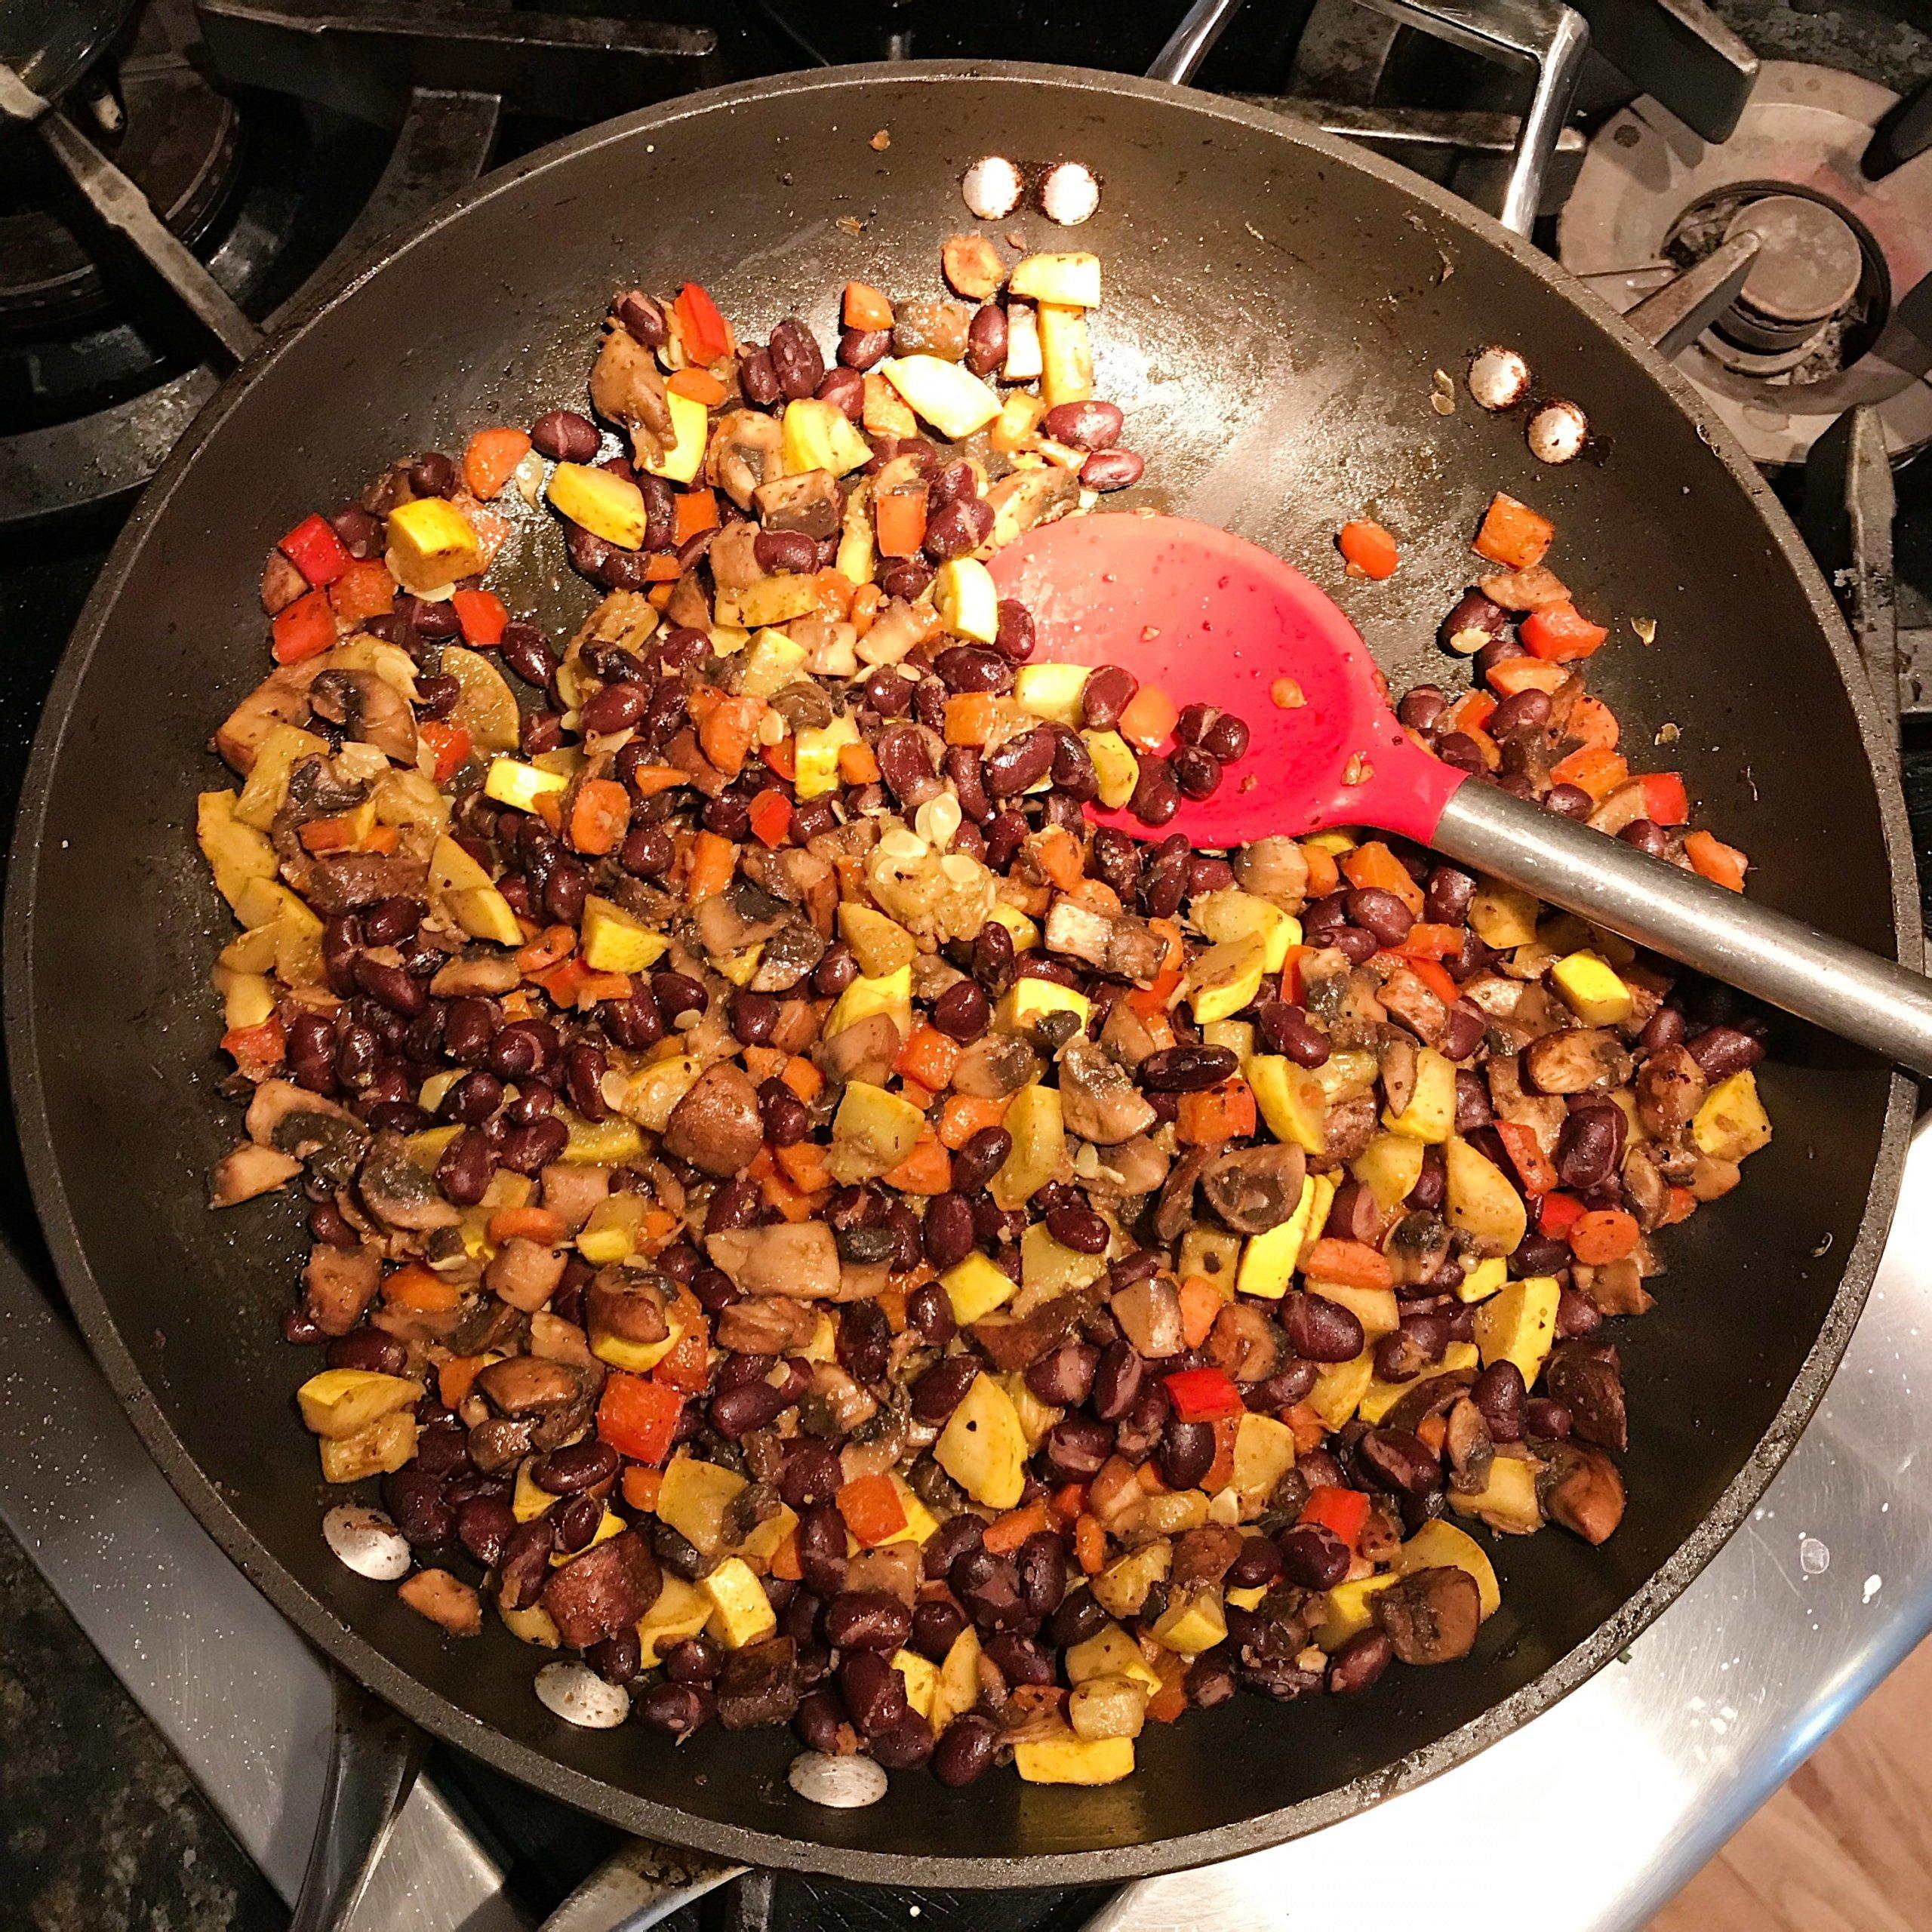 Mexican stuffed sweet potatoes gluten-free vegetarian grain-free #glutenfreerecipes www.healthygffamily.com